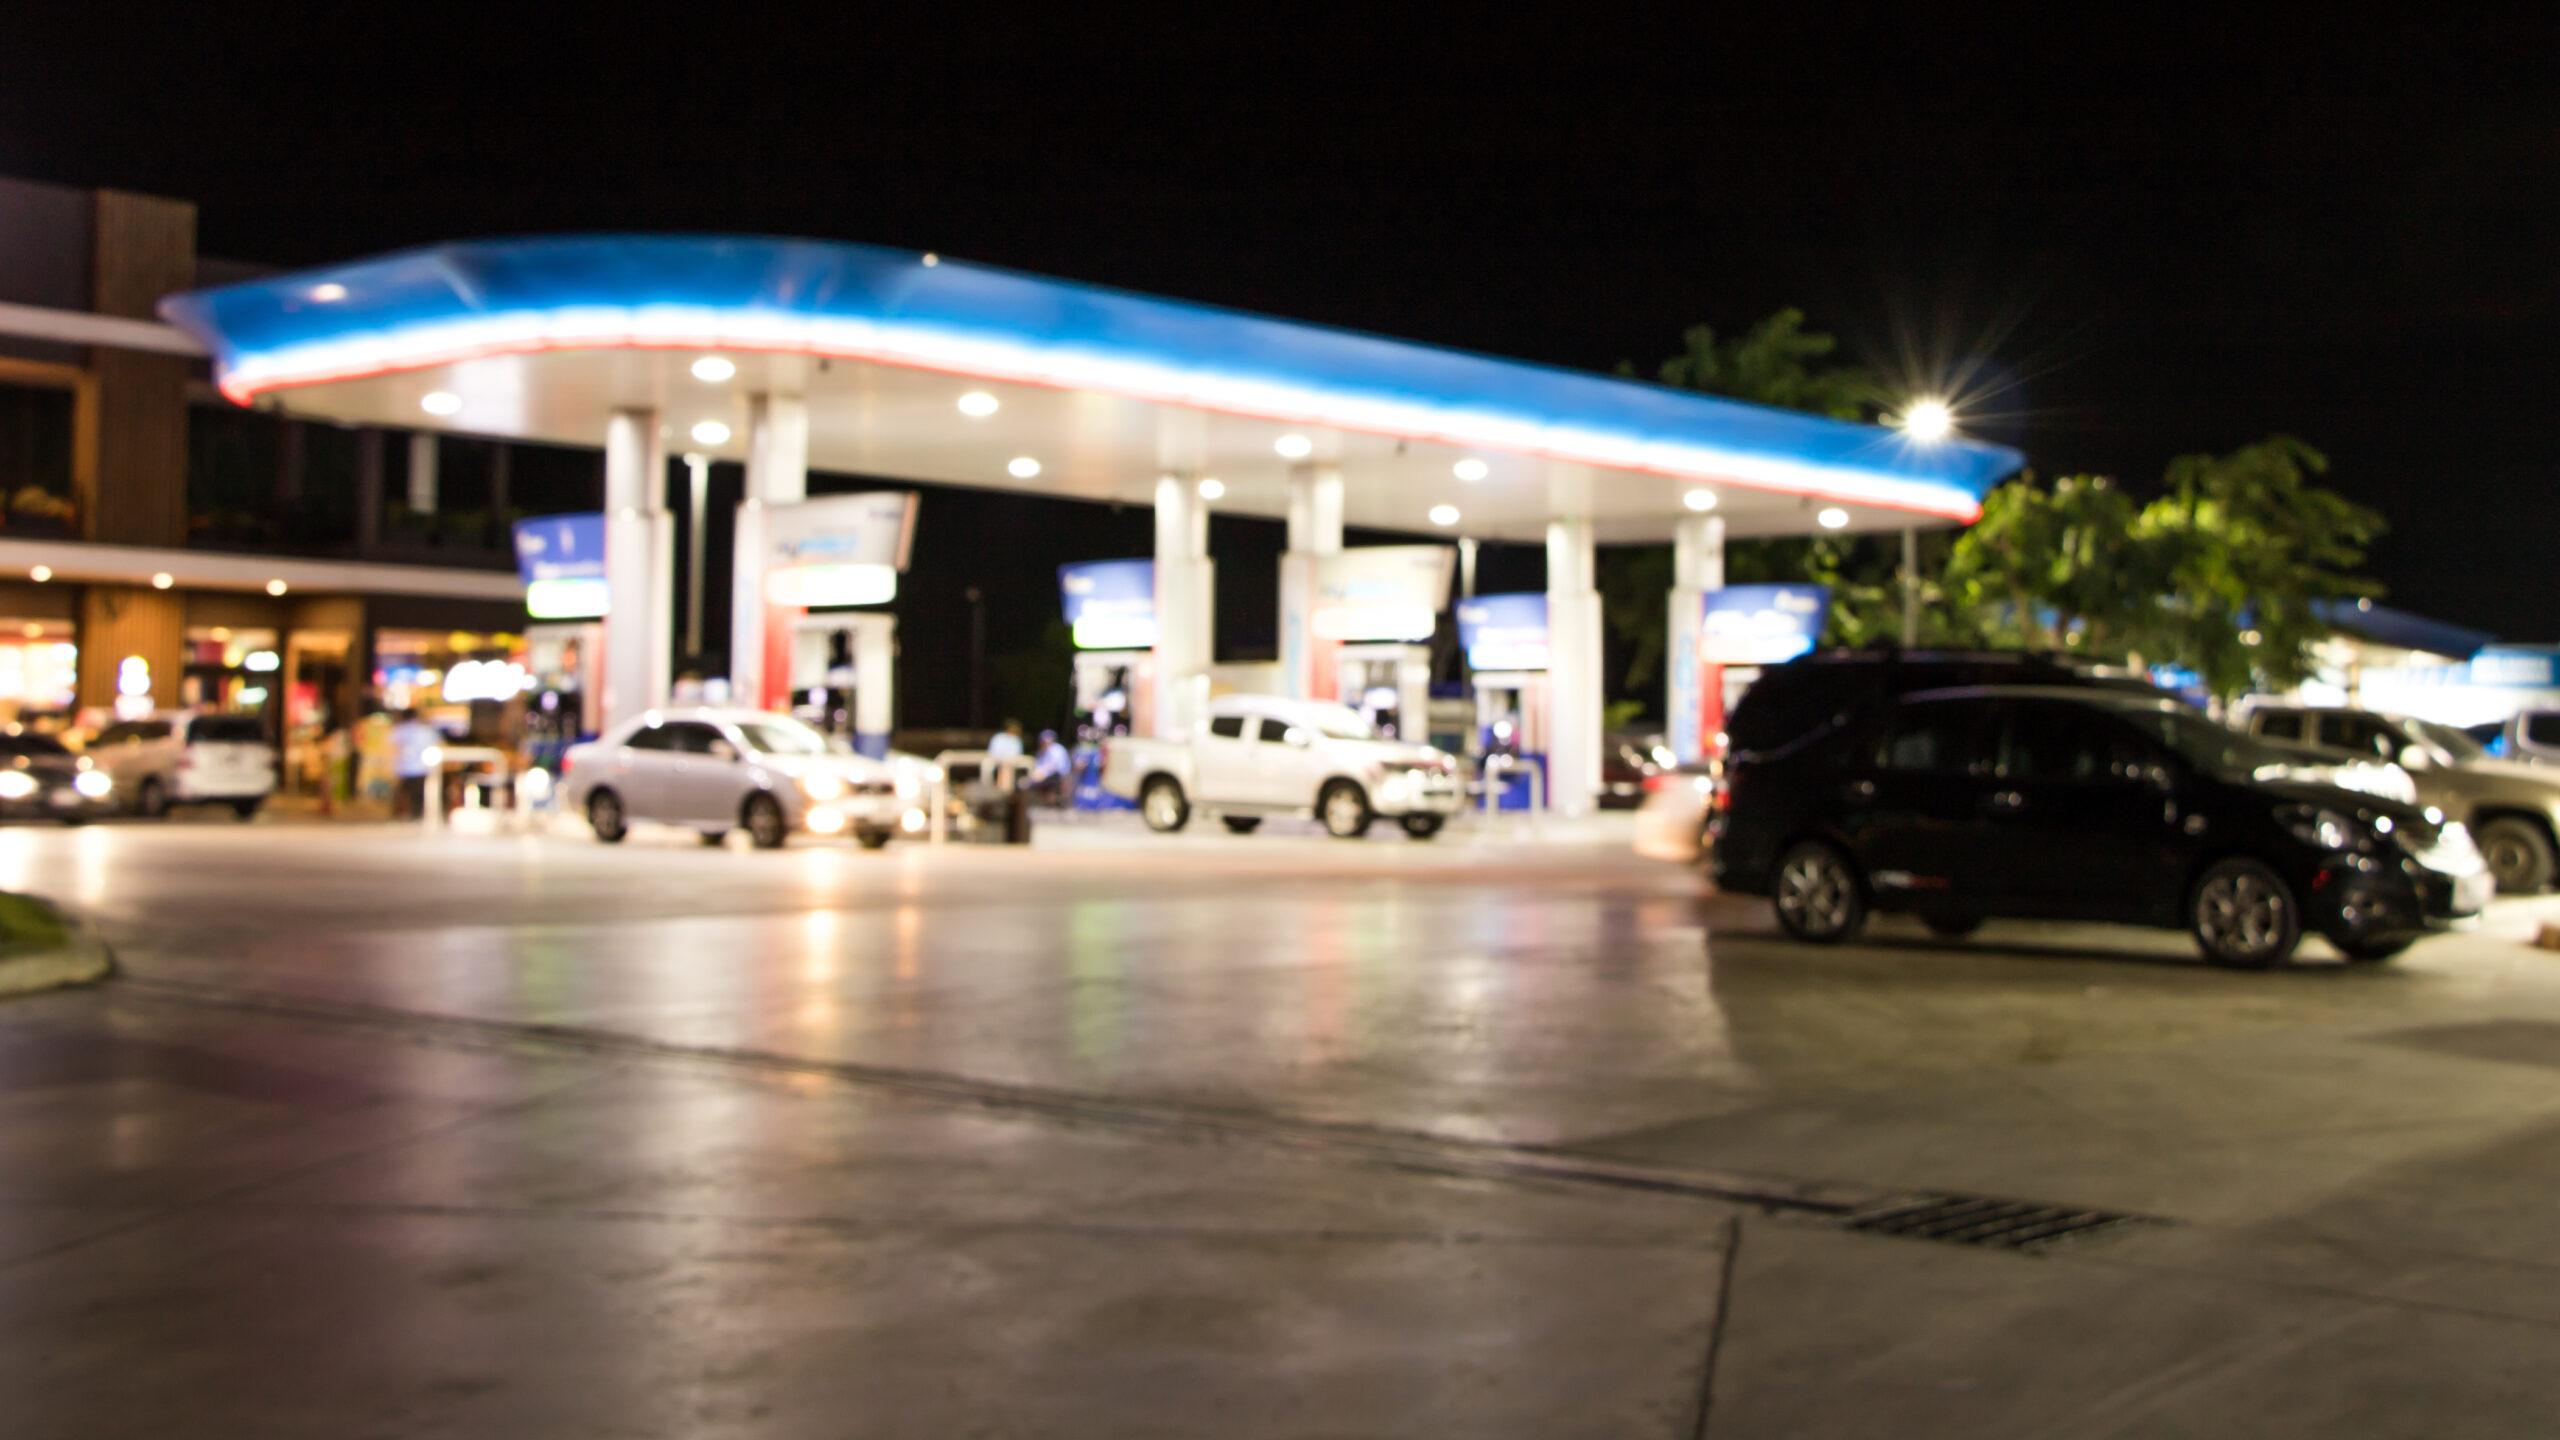 Cliente dá preferência a bandeira de posto de gasolina no momento de abastecer o seu veículo